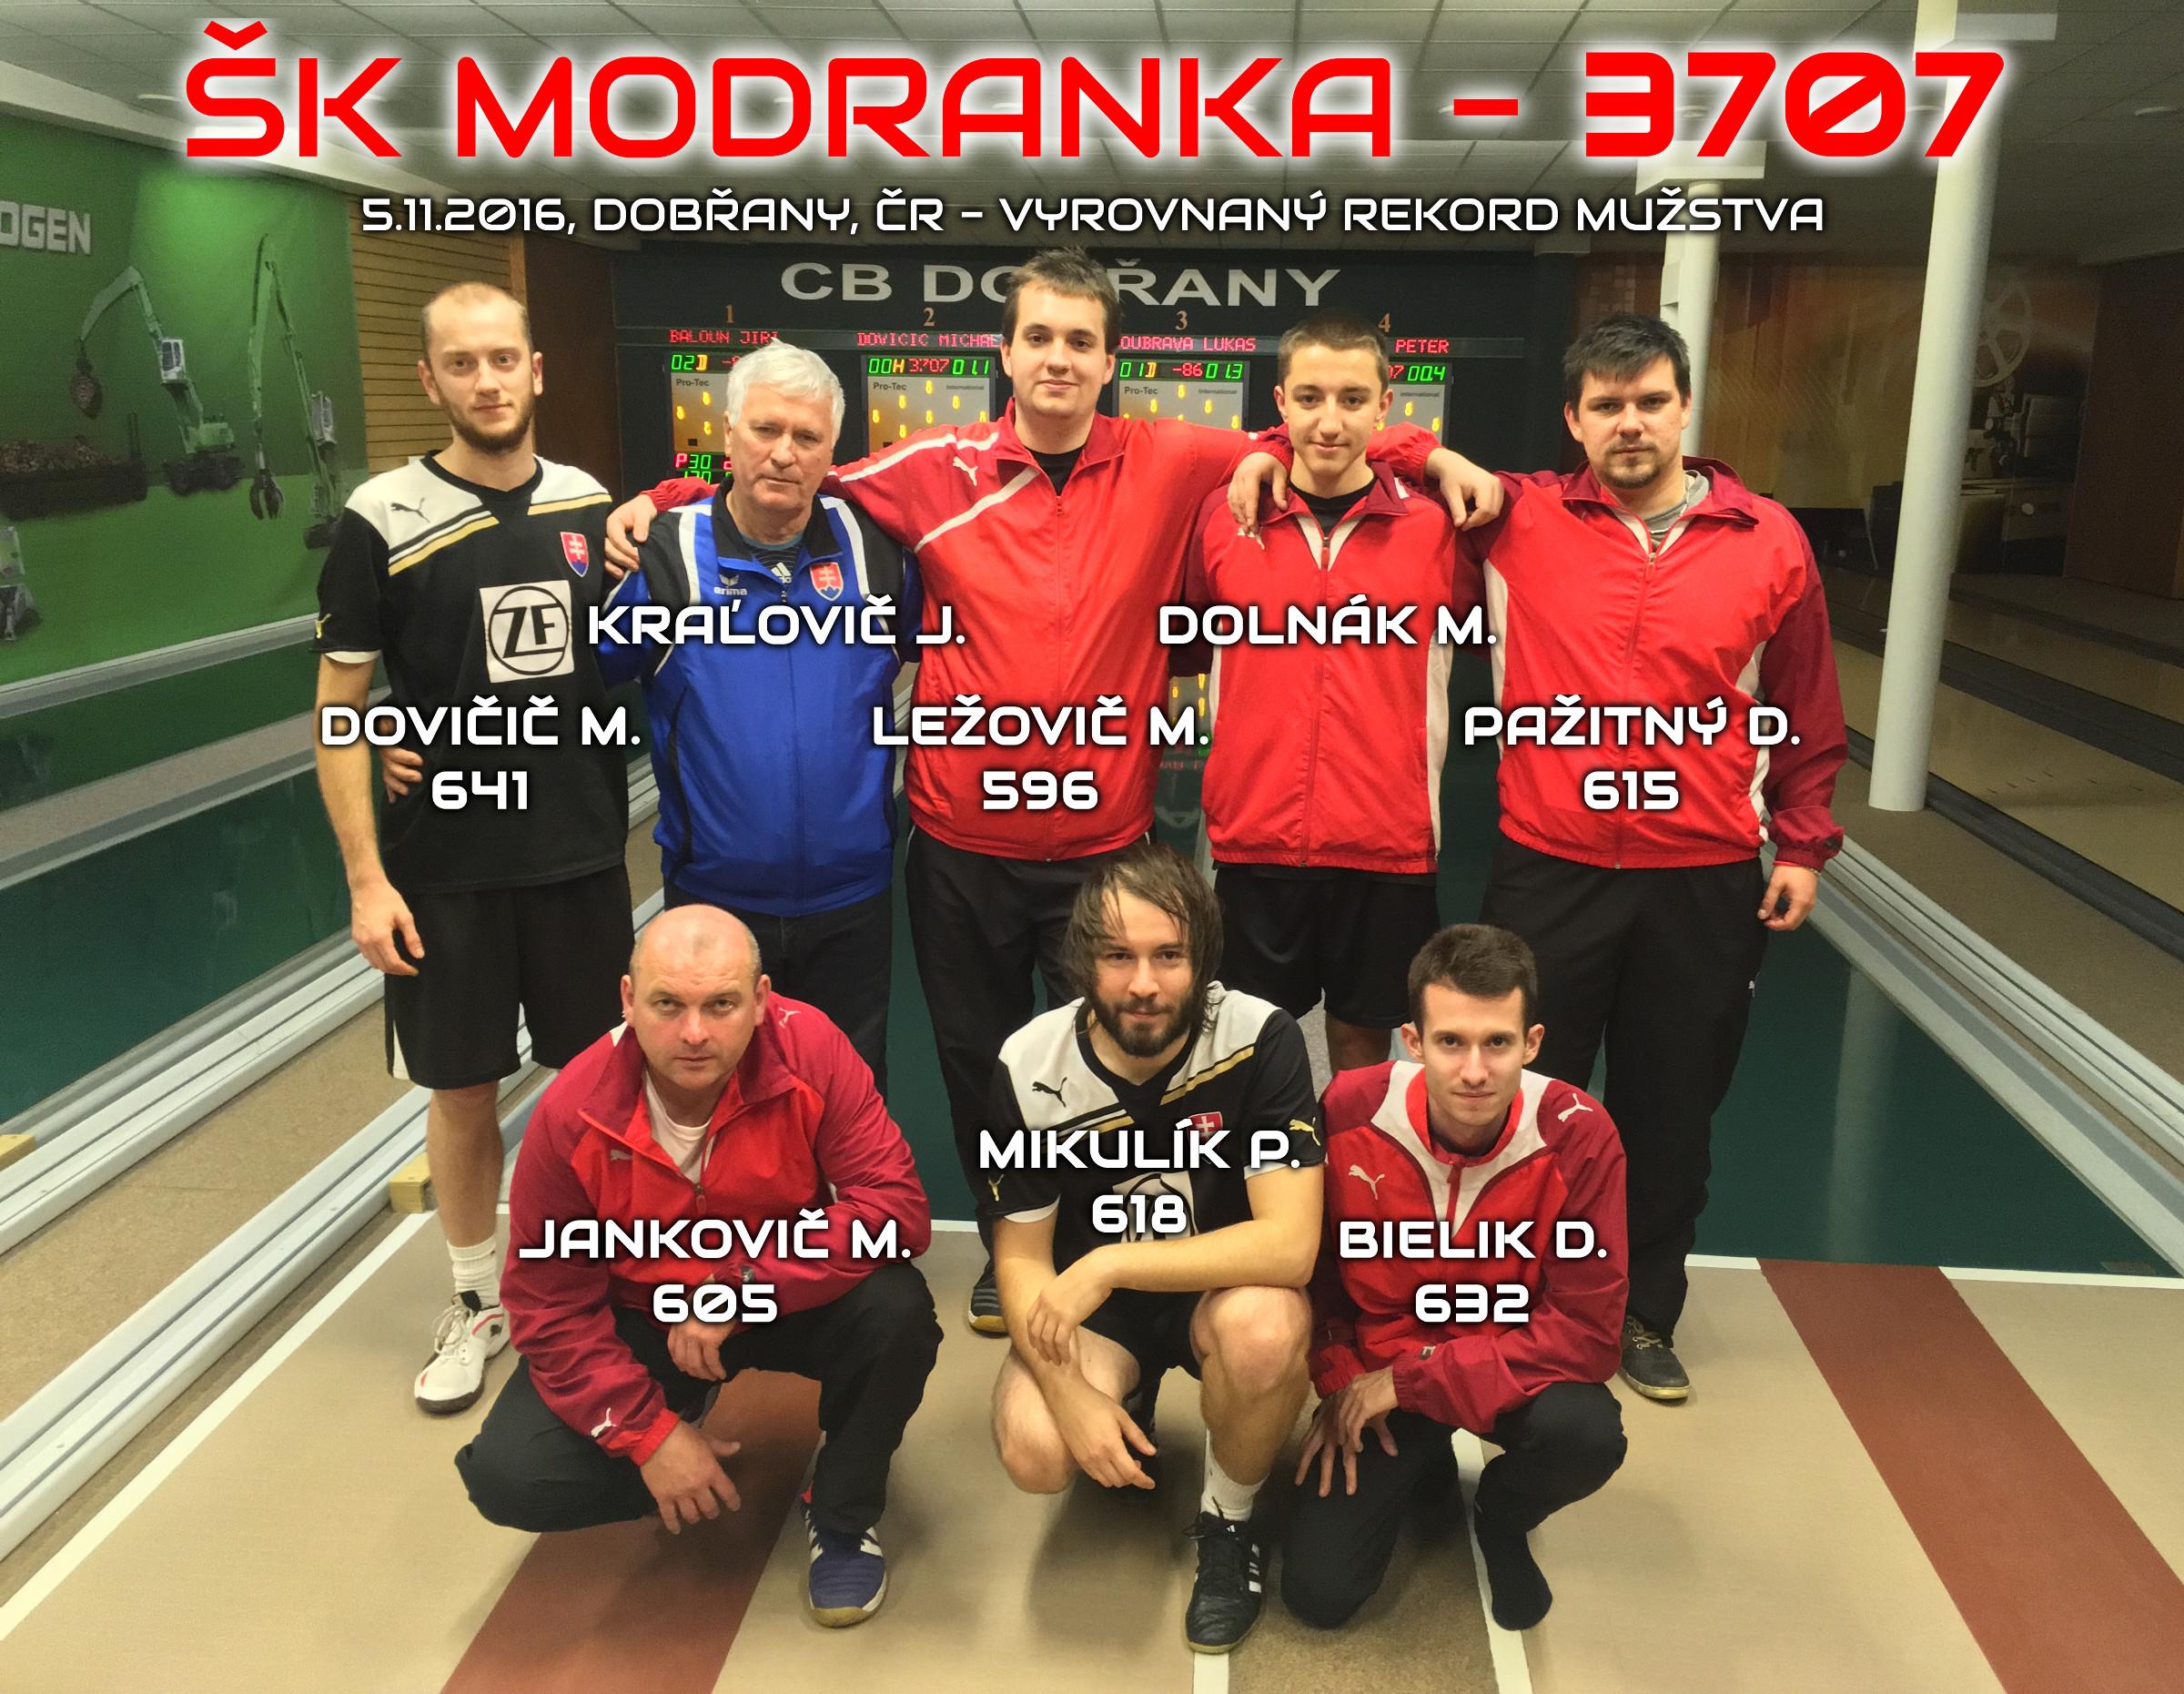 3707 šk modranka rekord mužstvo